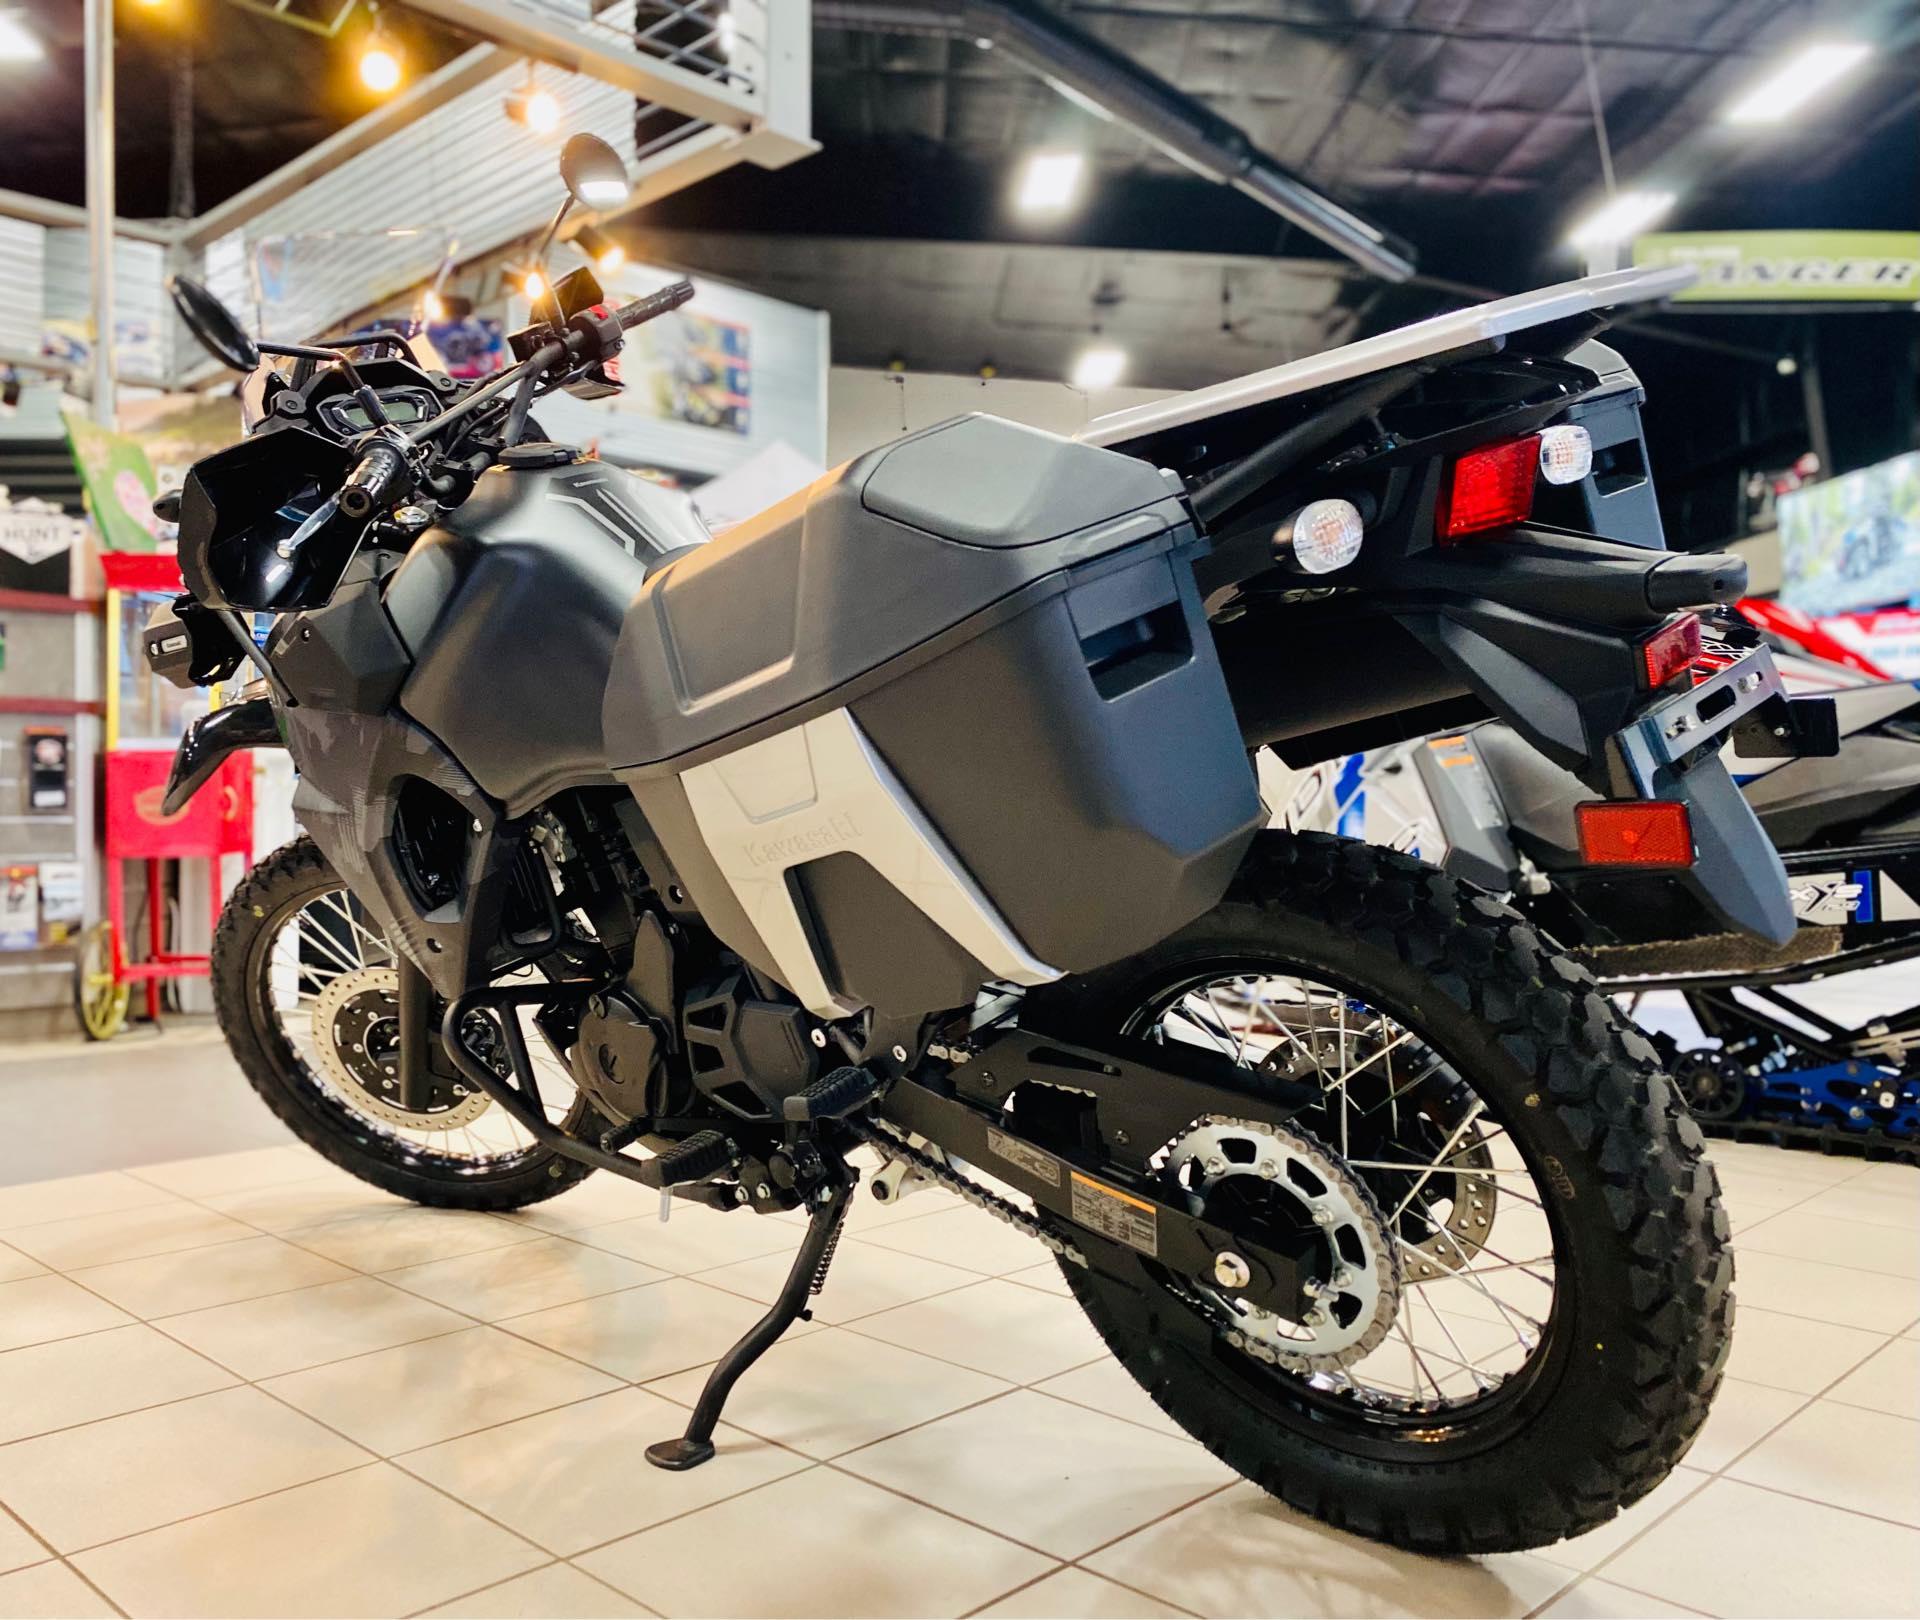 2022 Kawasaki KLR 650 Adventure at Rod's Ride On Powersports